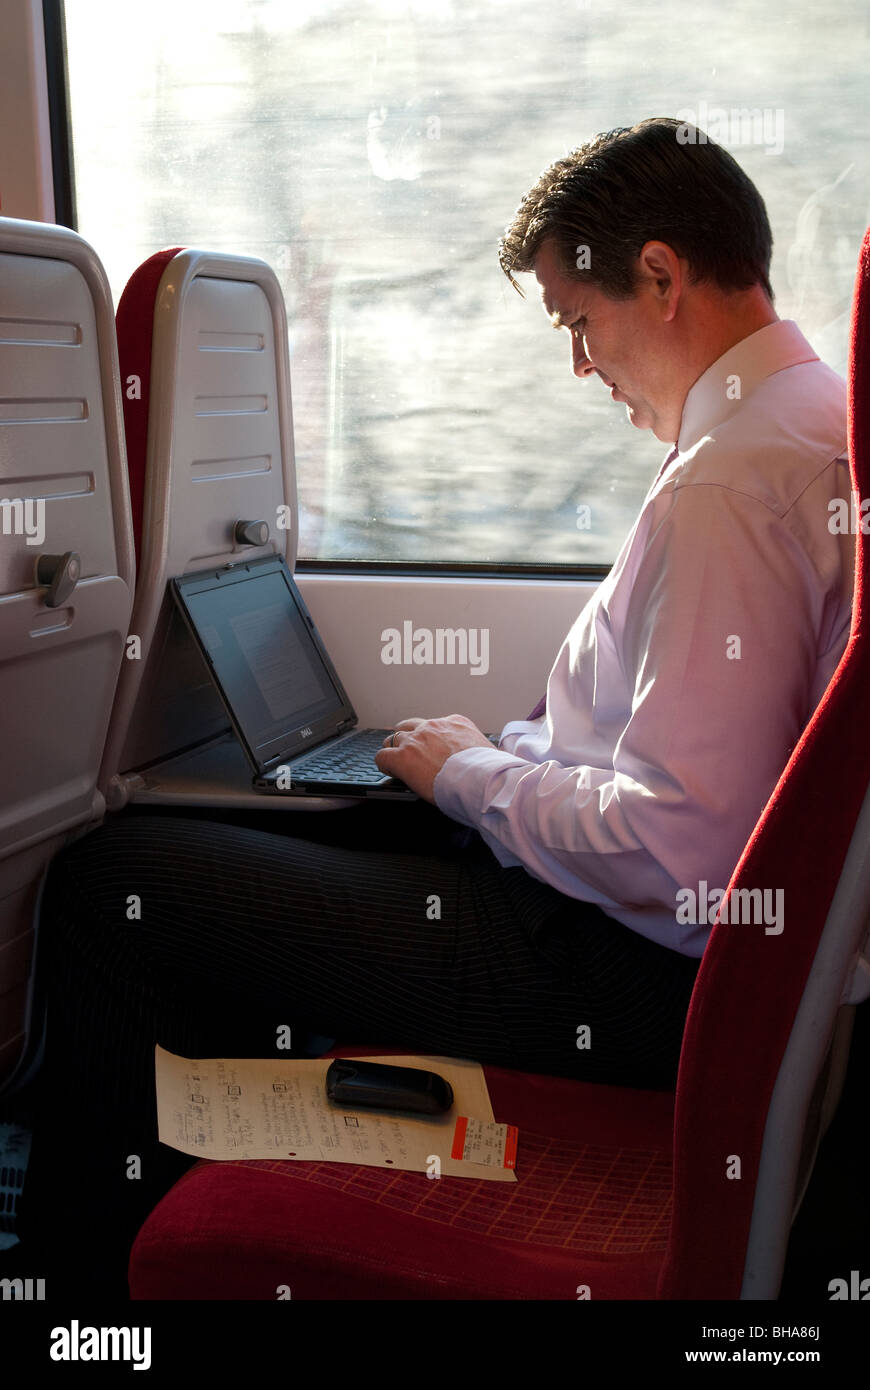 Business Mann Pendler mit Laptop-Computer auf Passagier-Bahnreise Stockfoto